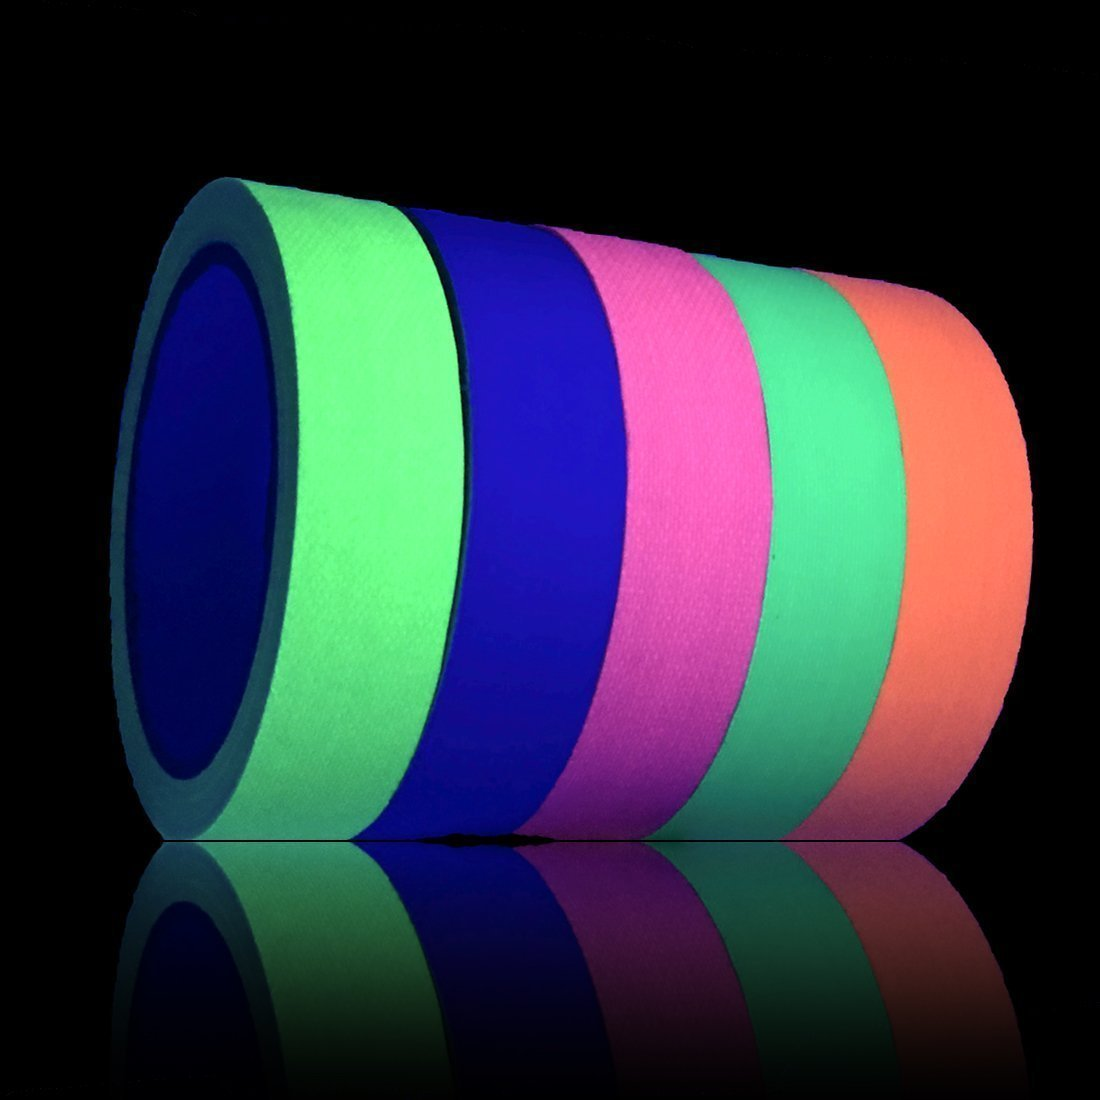 USHIO F8T5BL 7.2W UV Blacklight Fluorescent Lamp